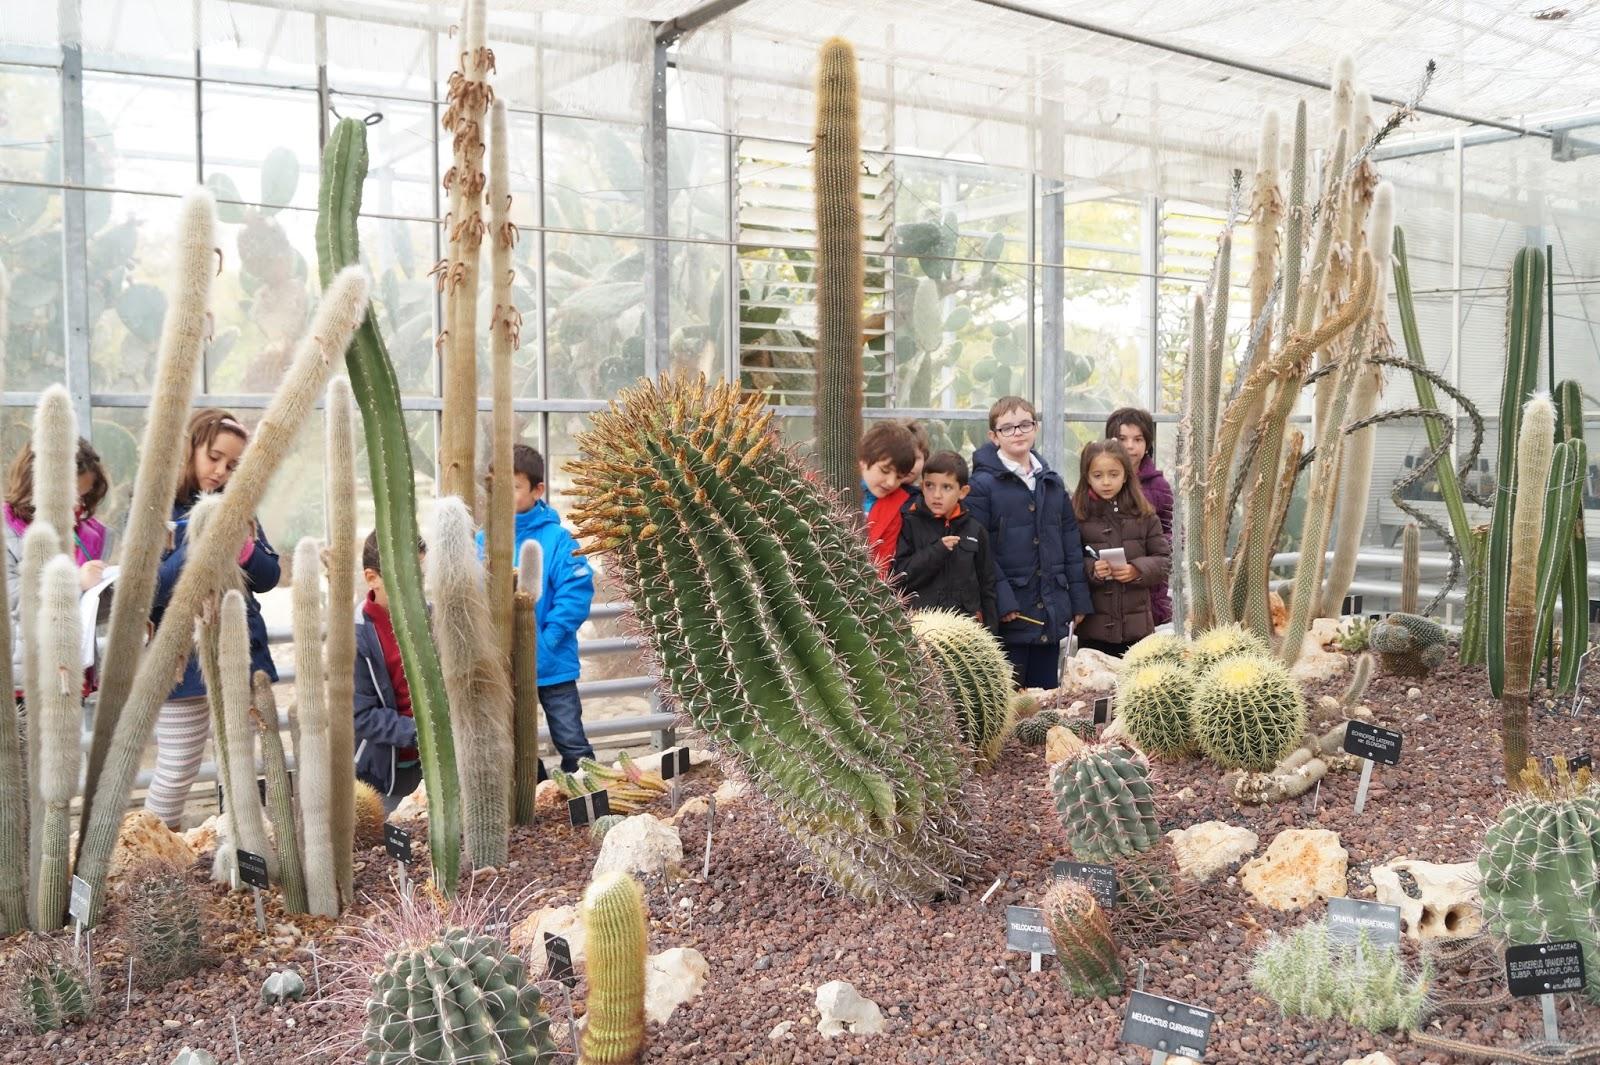 Peri dico digital del ceip pablo neruda excursi n al for Ceip jardin botanico